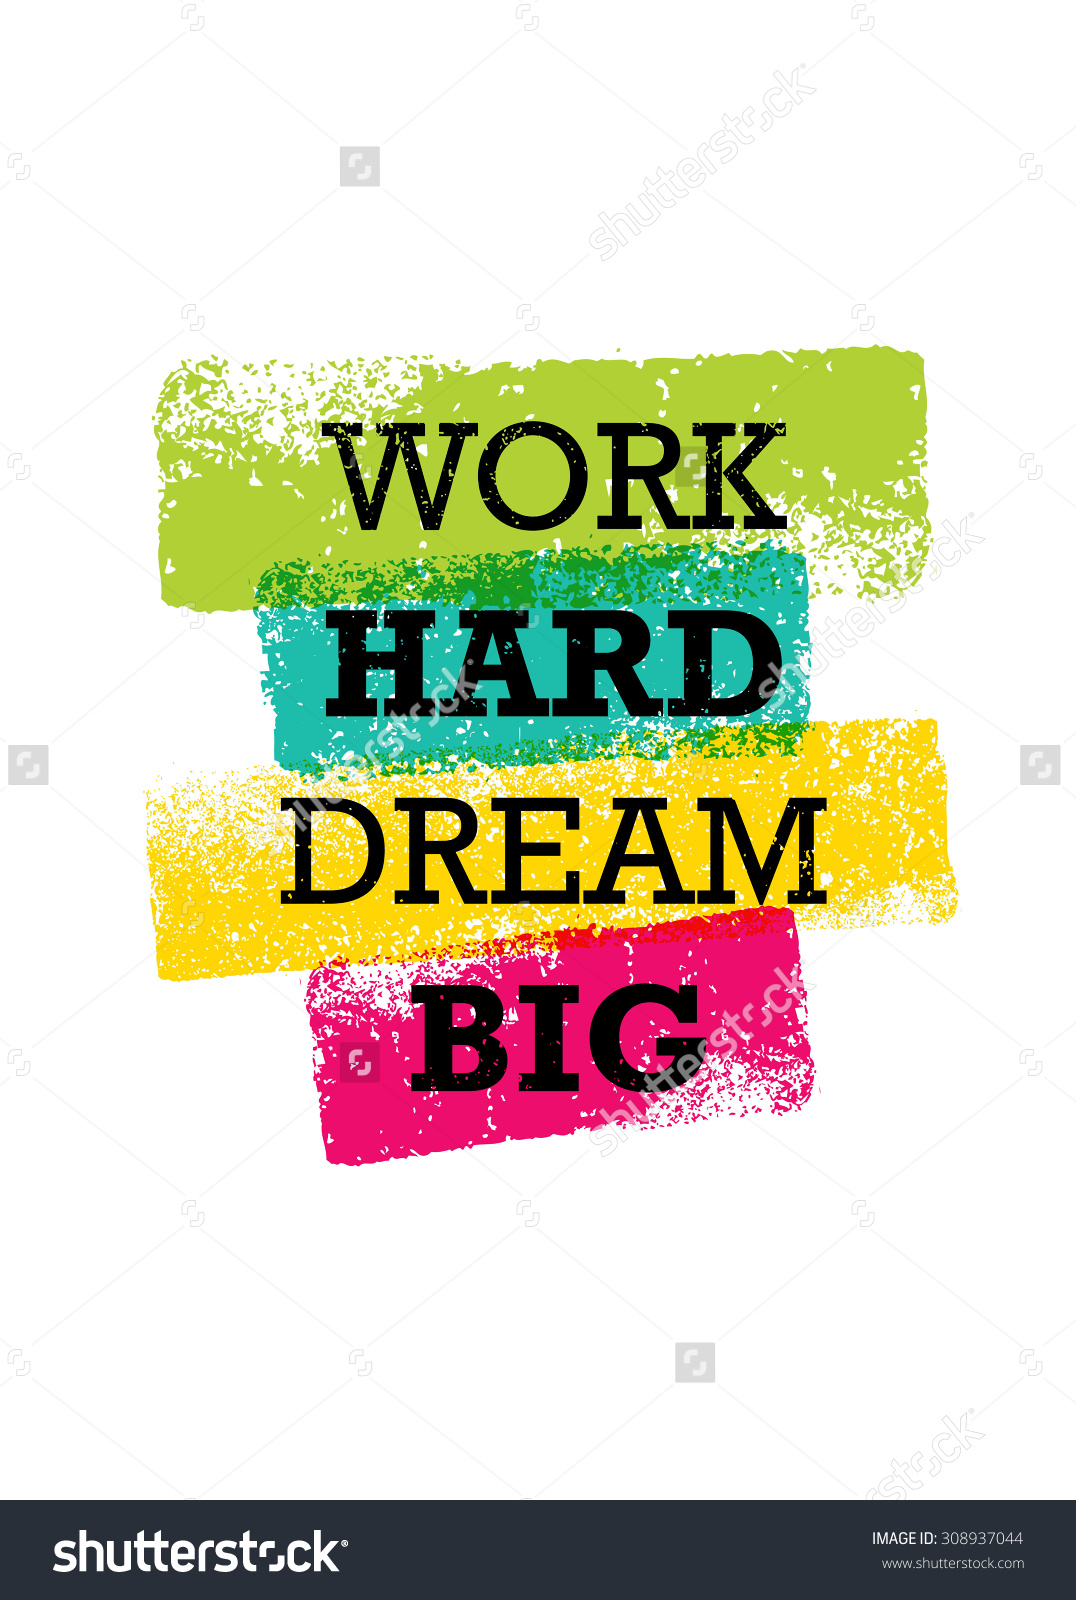 Work Hard Dream Big Creative Motivation Stock Vector 308937044.